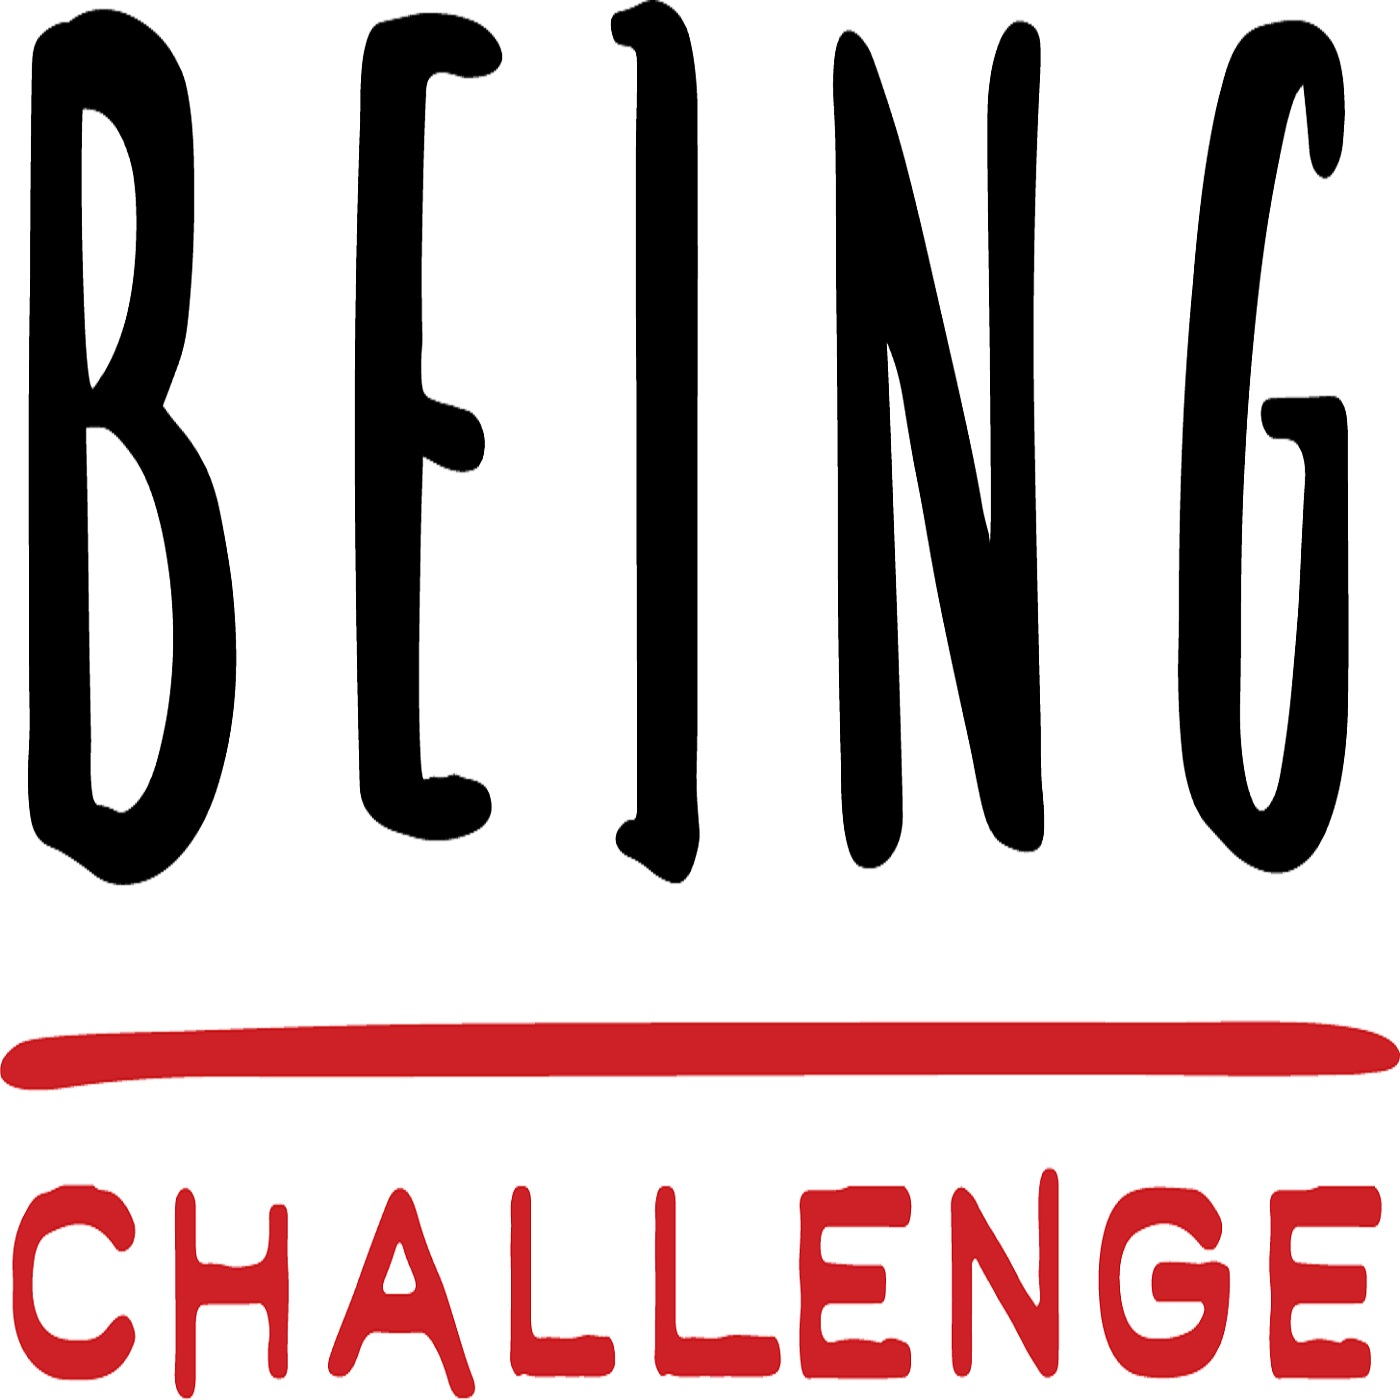 Being Challenge